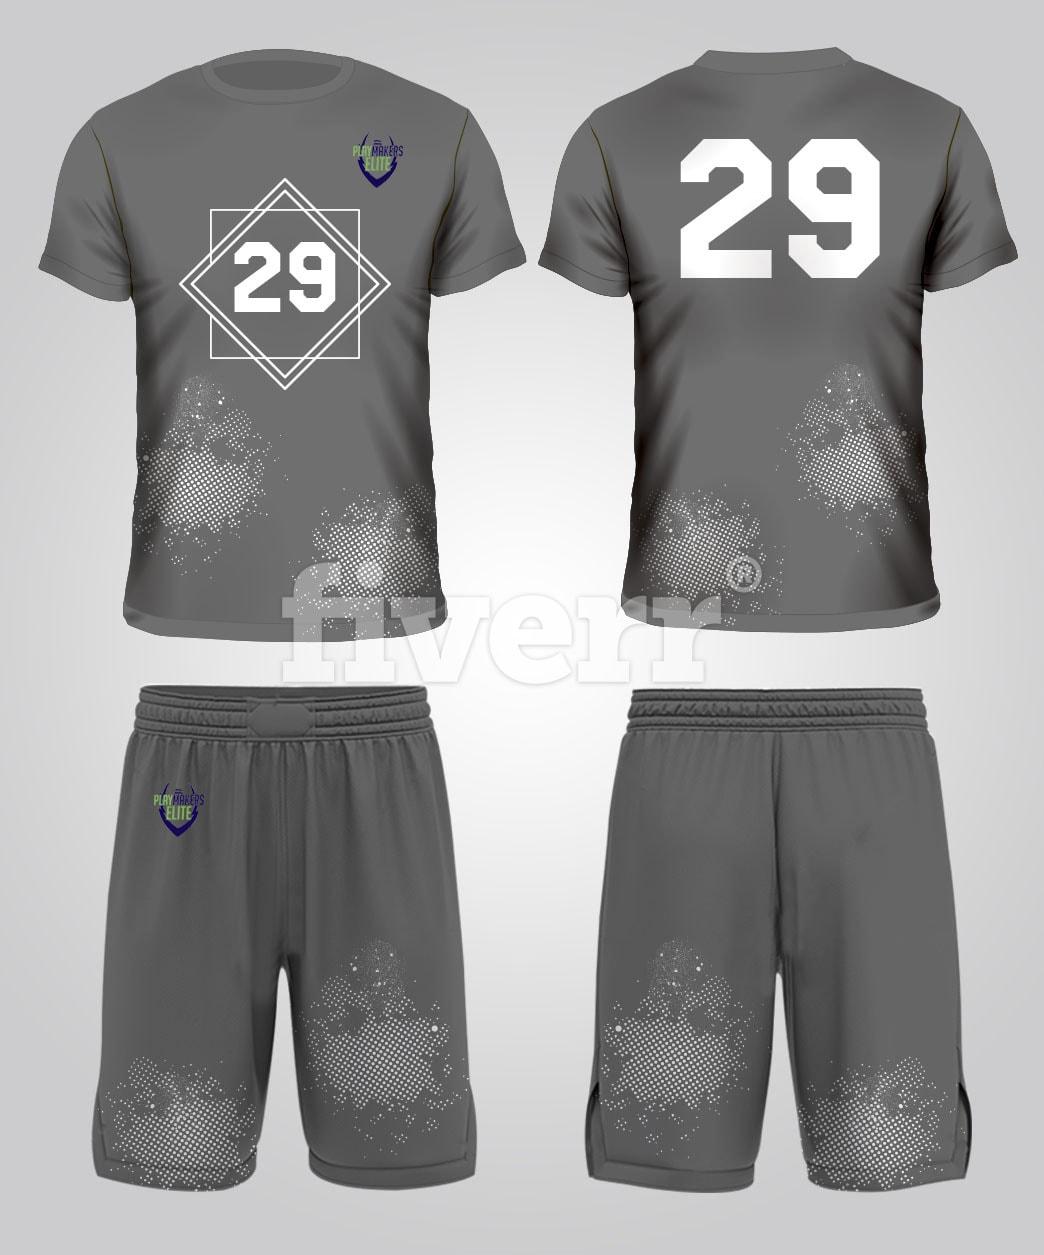 fae3f81a65f Design Best American Football Uniform And 3d Mockup By Graphicsguru11